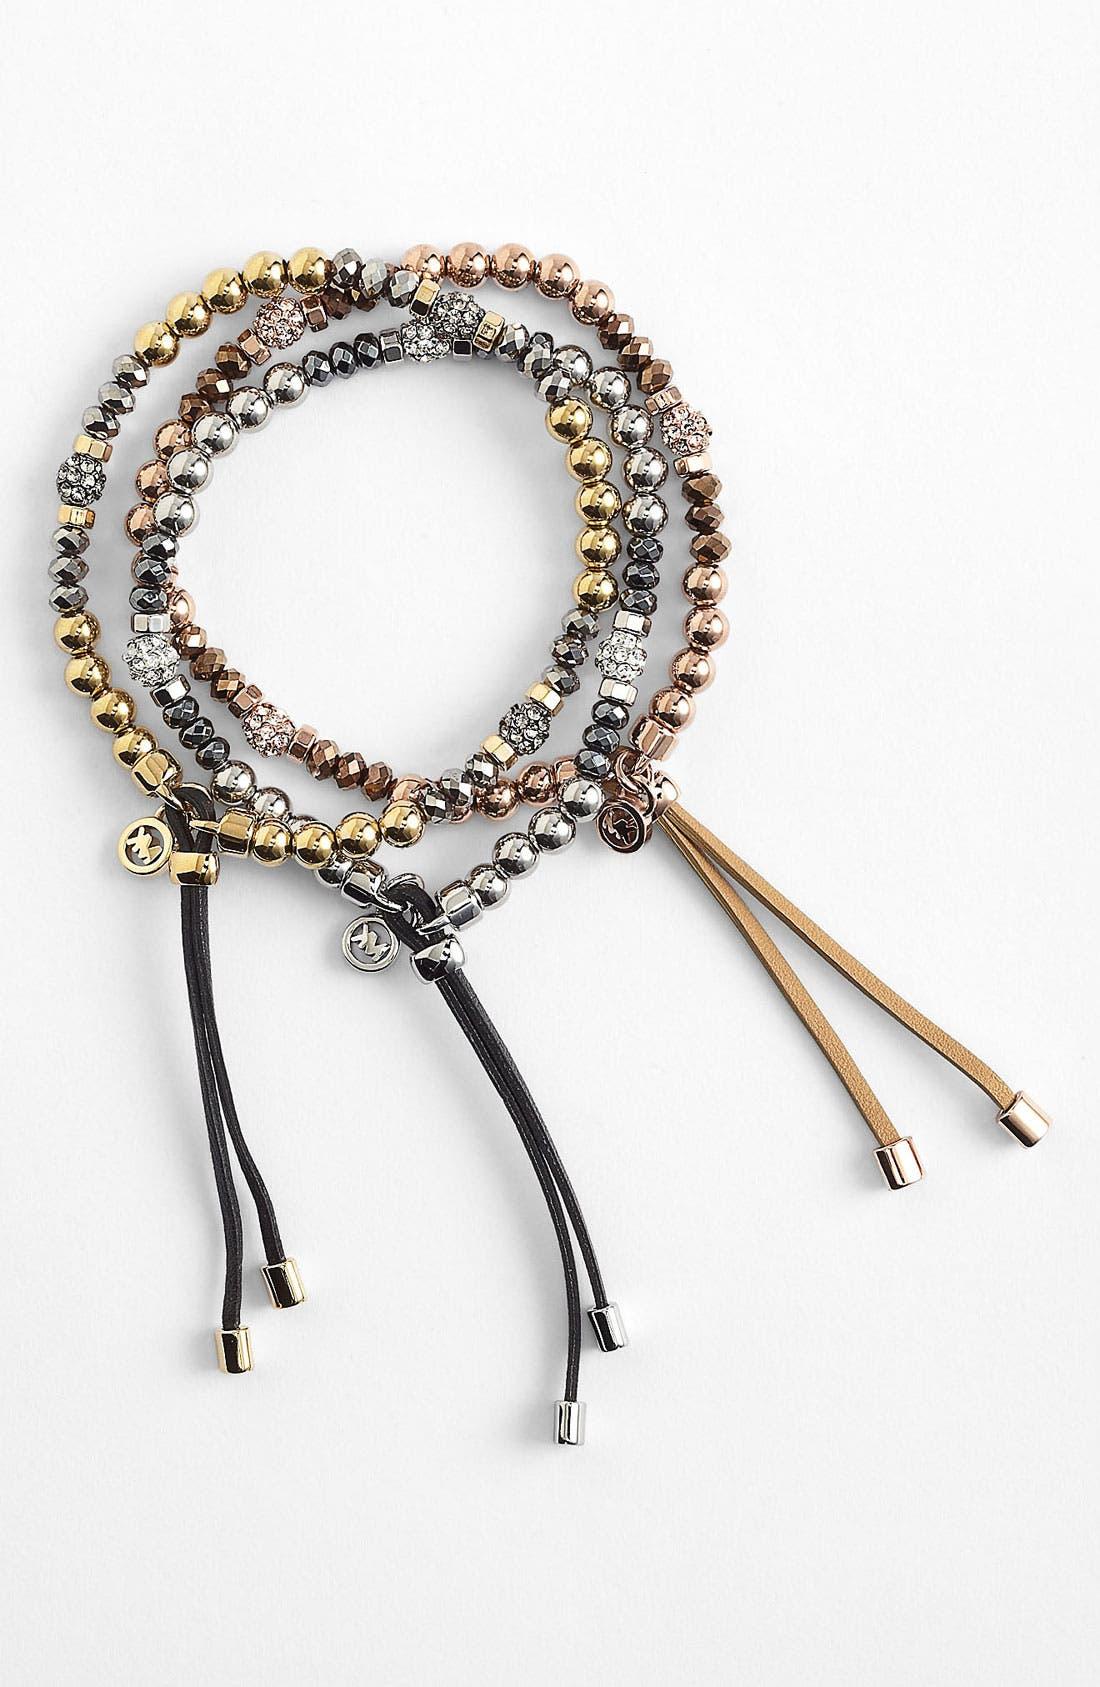 Alternate Image 1 Selected - Michael Kors 'Brilliance' Stretch Bracelet